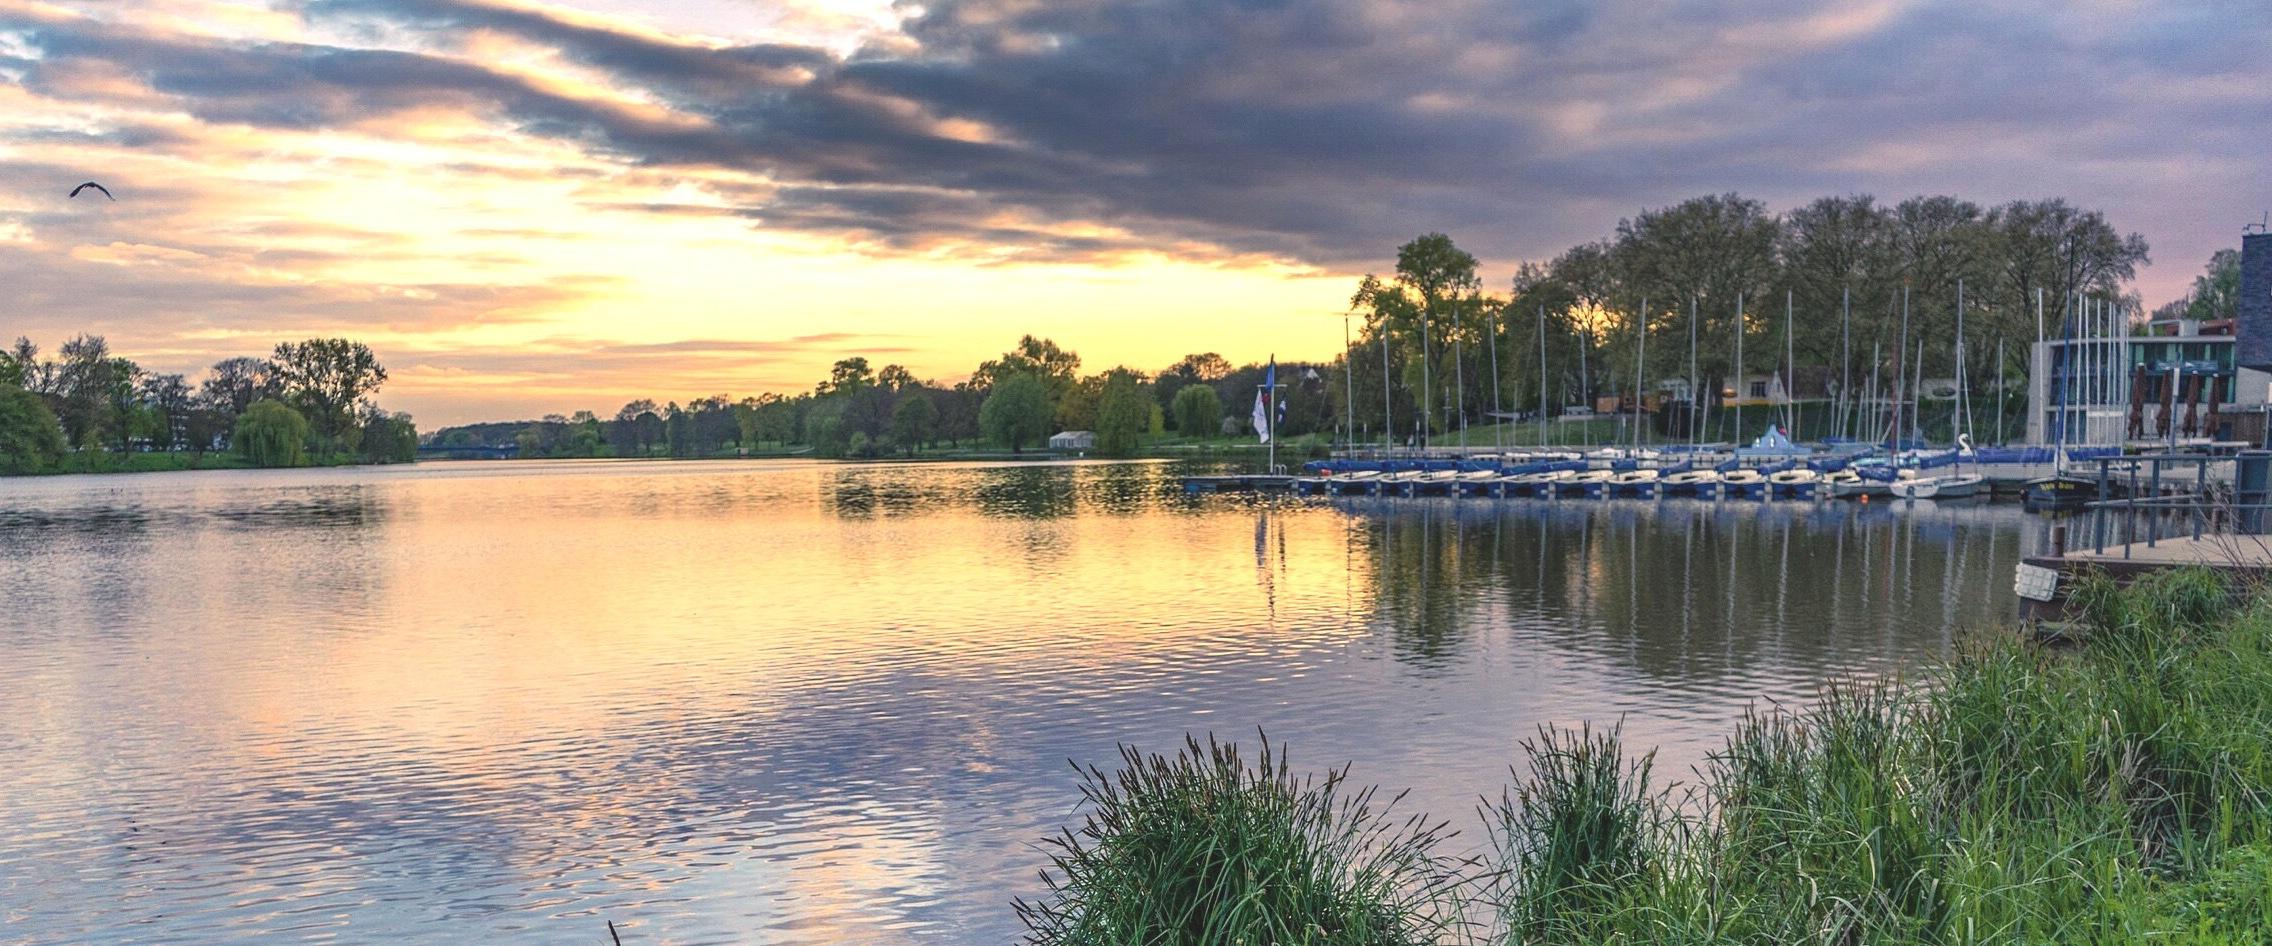 Недостиг на кислород уби 20 тона риба в германско езеро